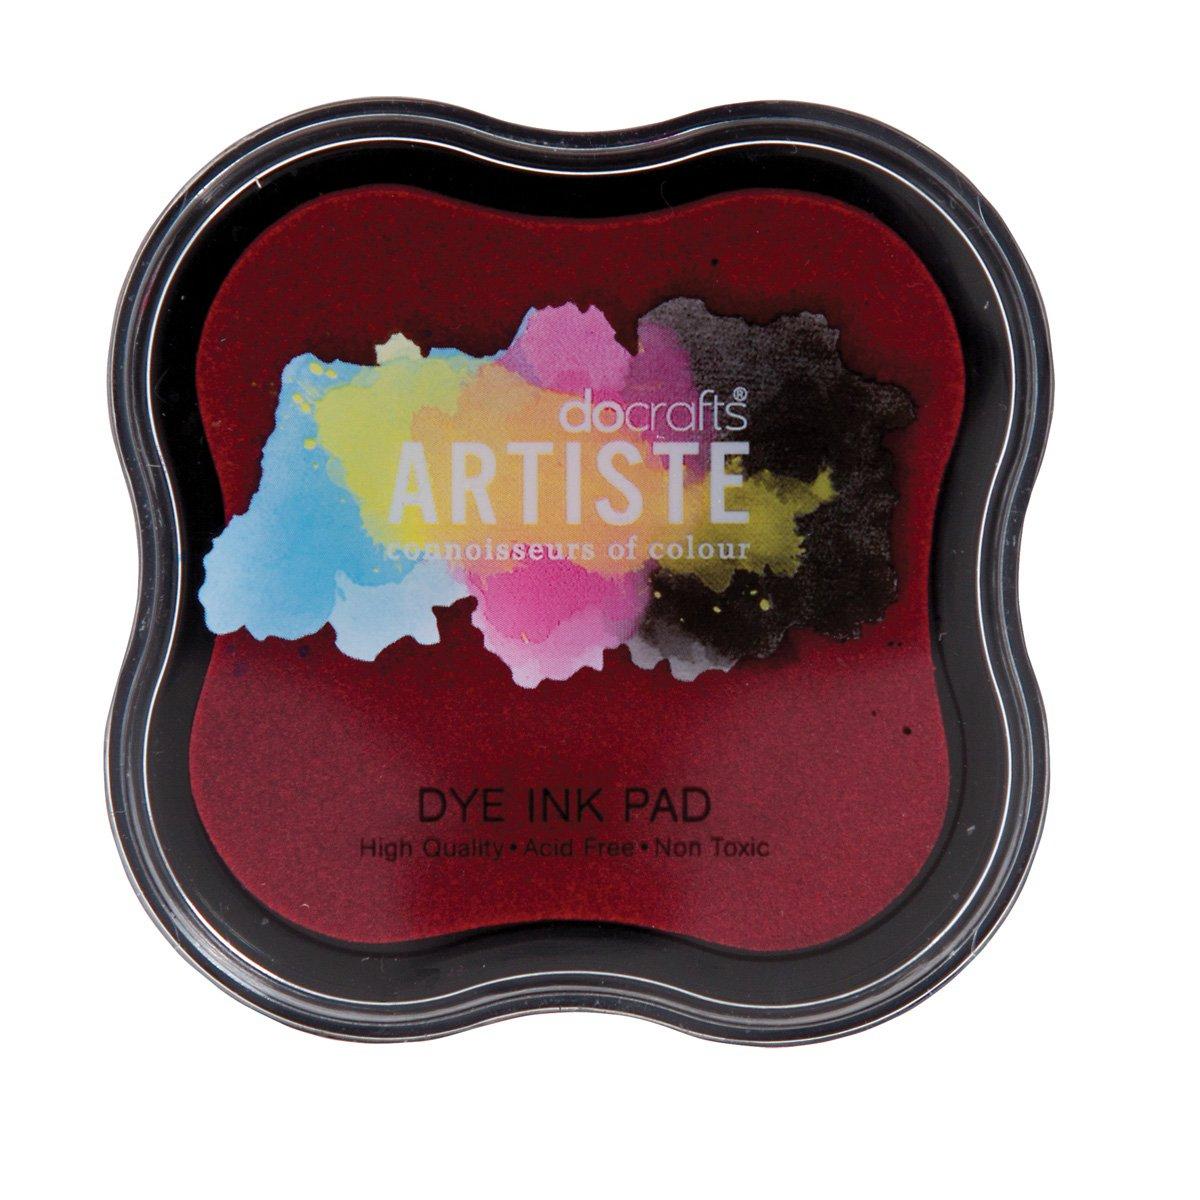 negro Artiste Dye Ink Pad